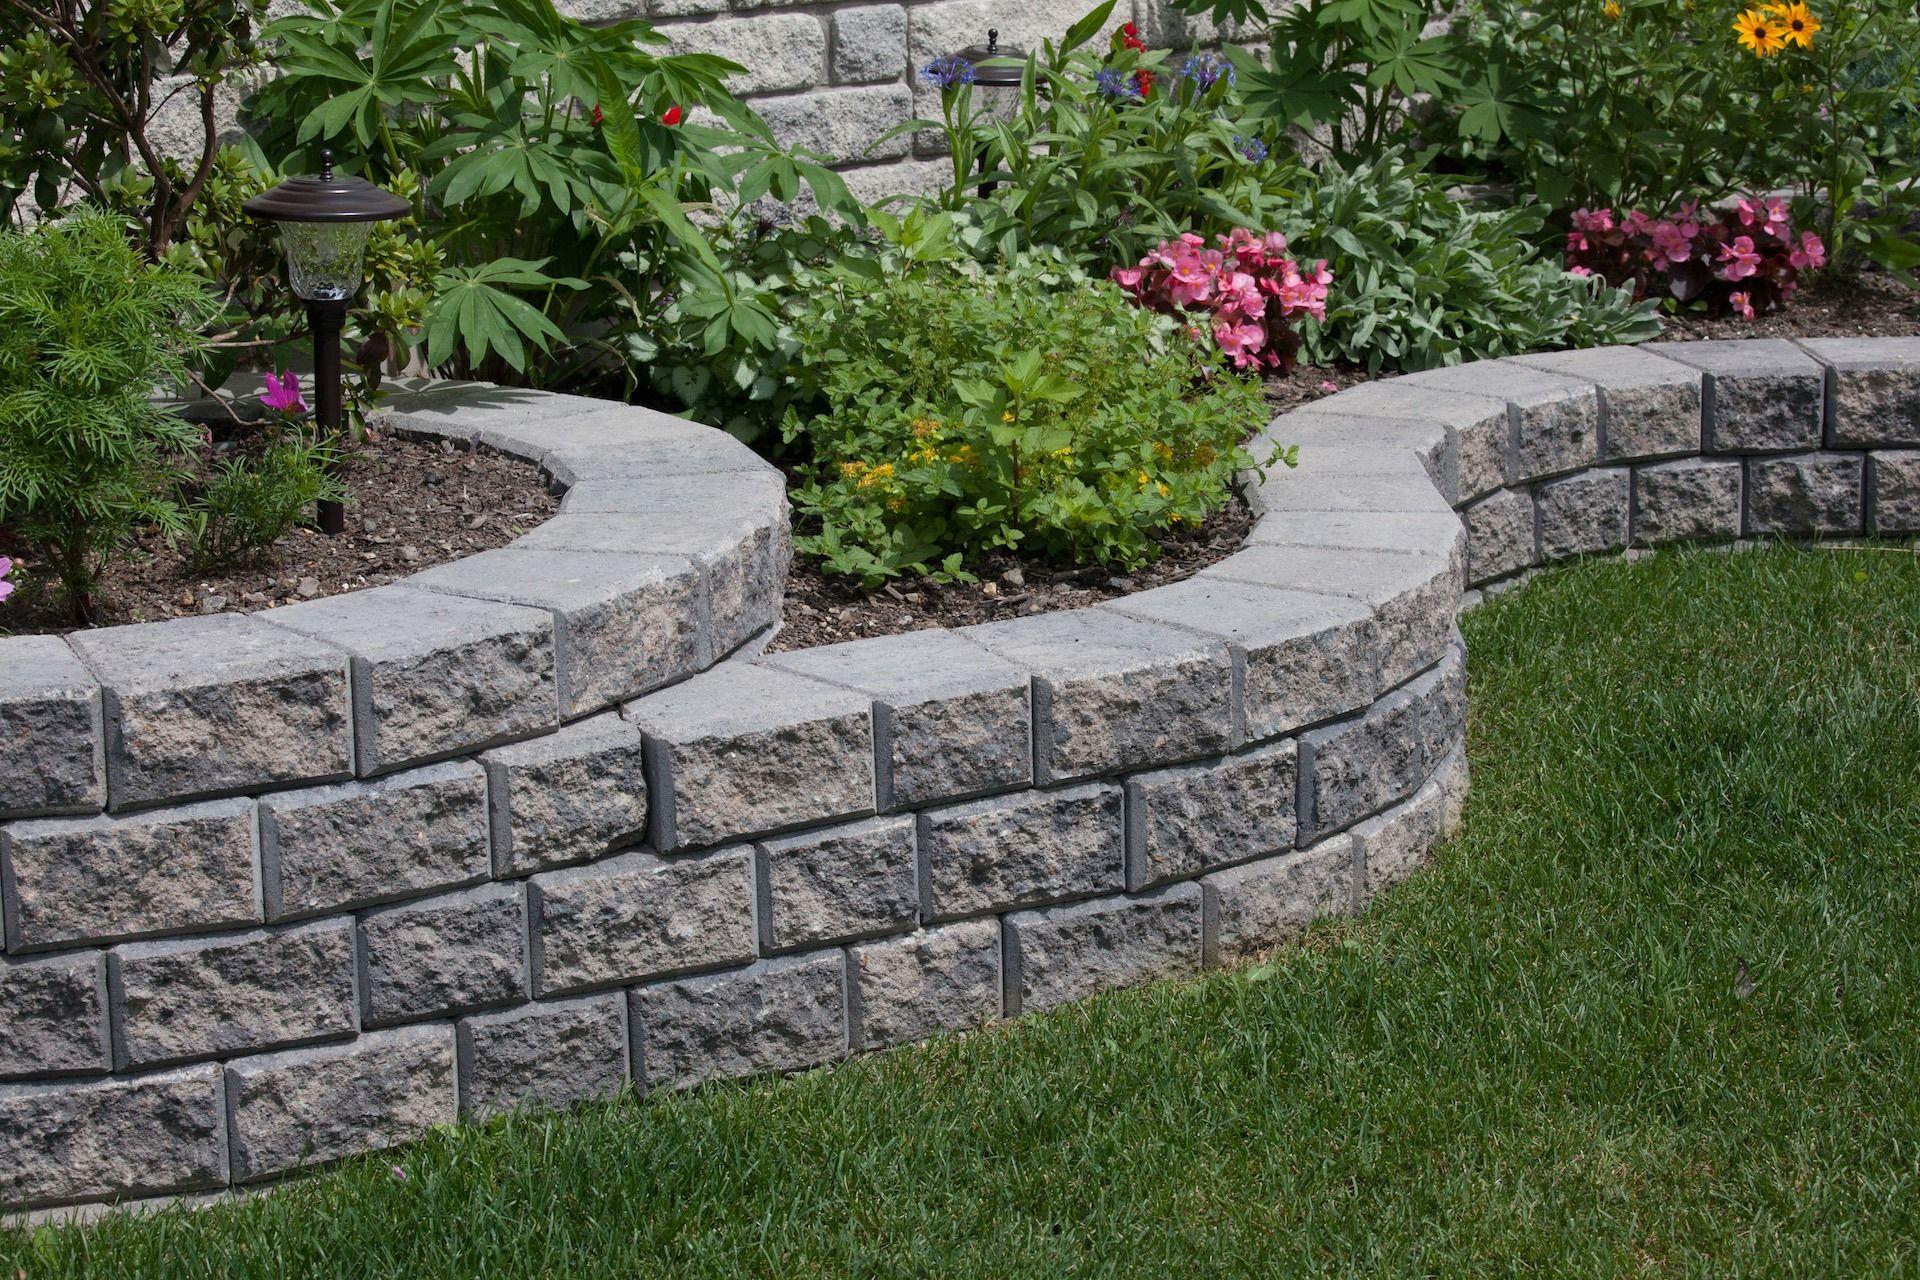 Stack Stone Landscape Blocks Patio Walls Shaw Brick Stone Landscaping Brick Wall Gardens Landscape Bricks